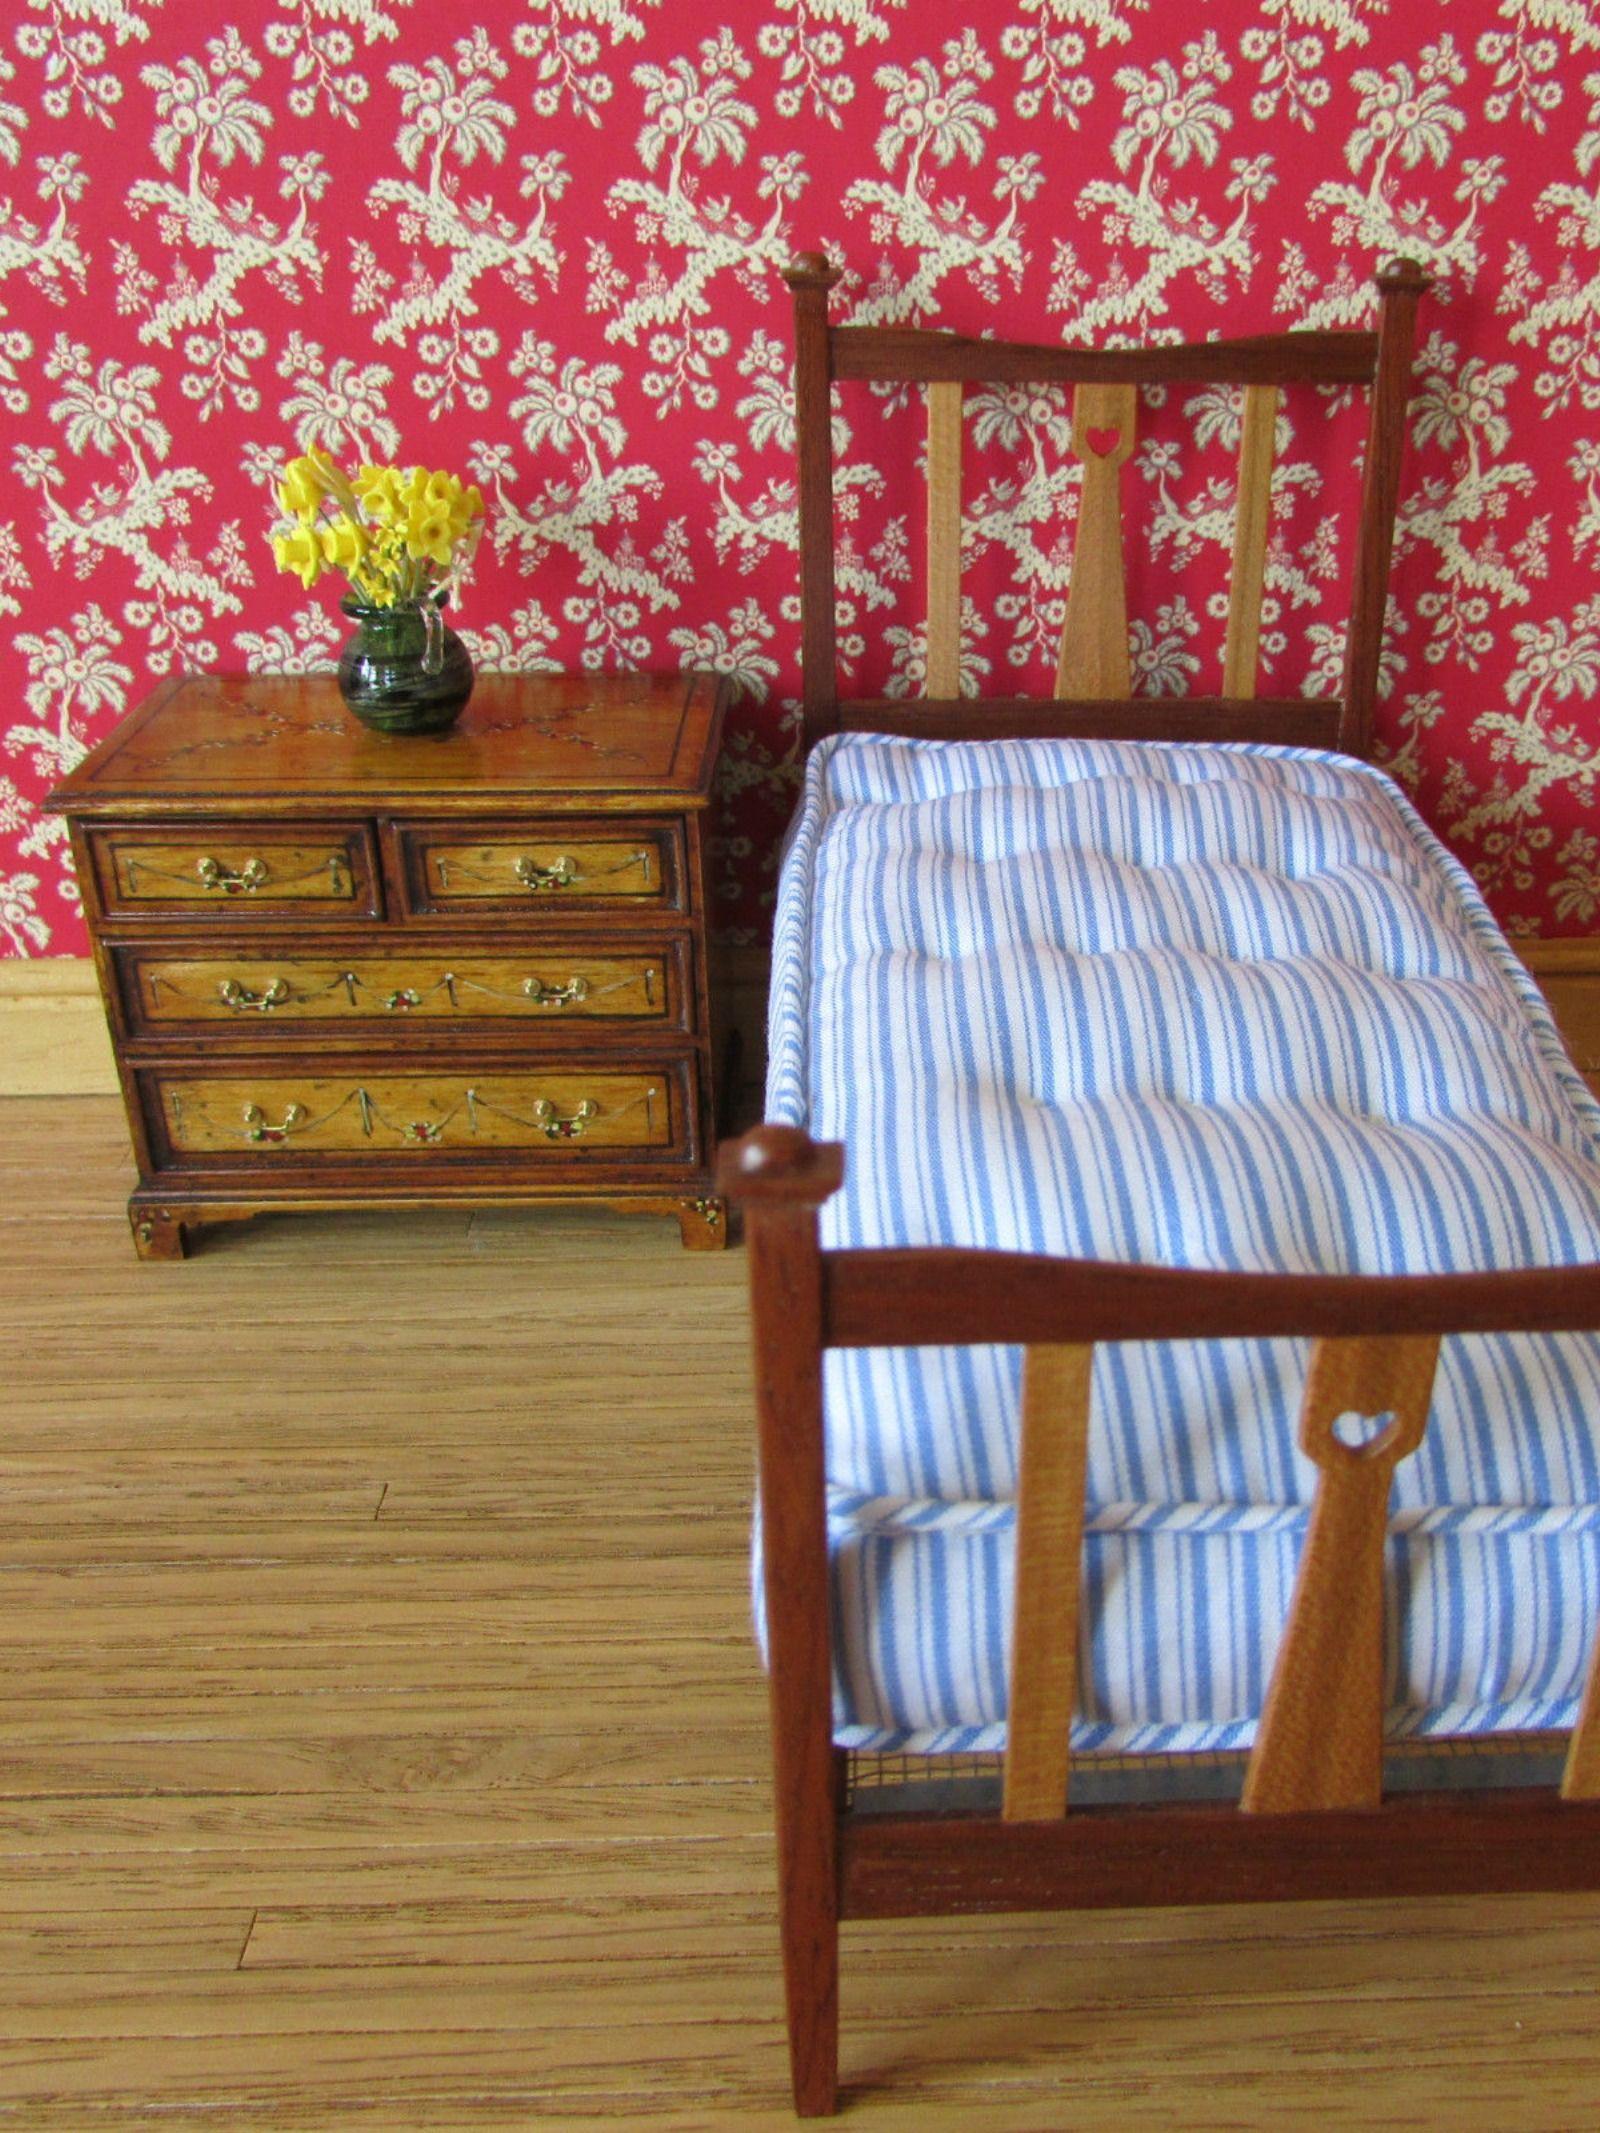 Dolls House Miniature Bedroom Furniture 1:12th Scale Mahogany Two Door Wardrobe